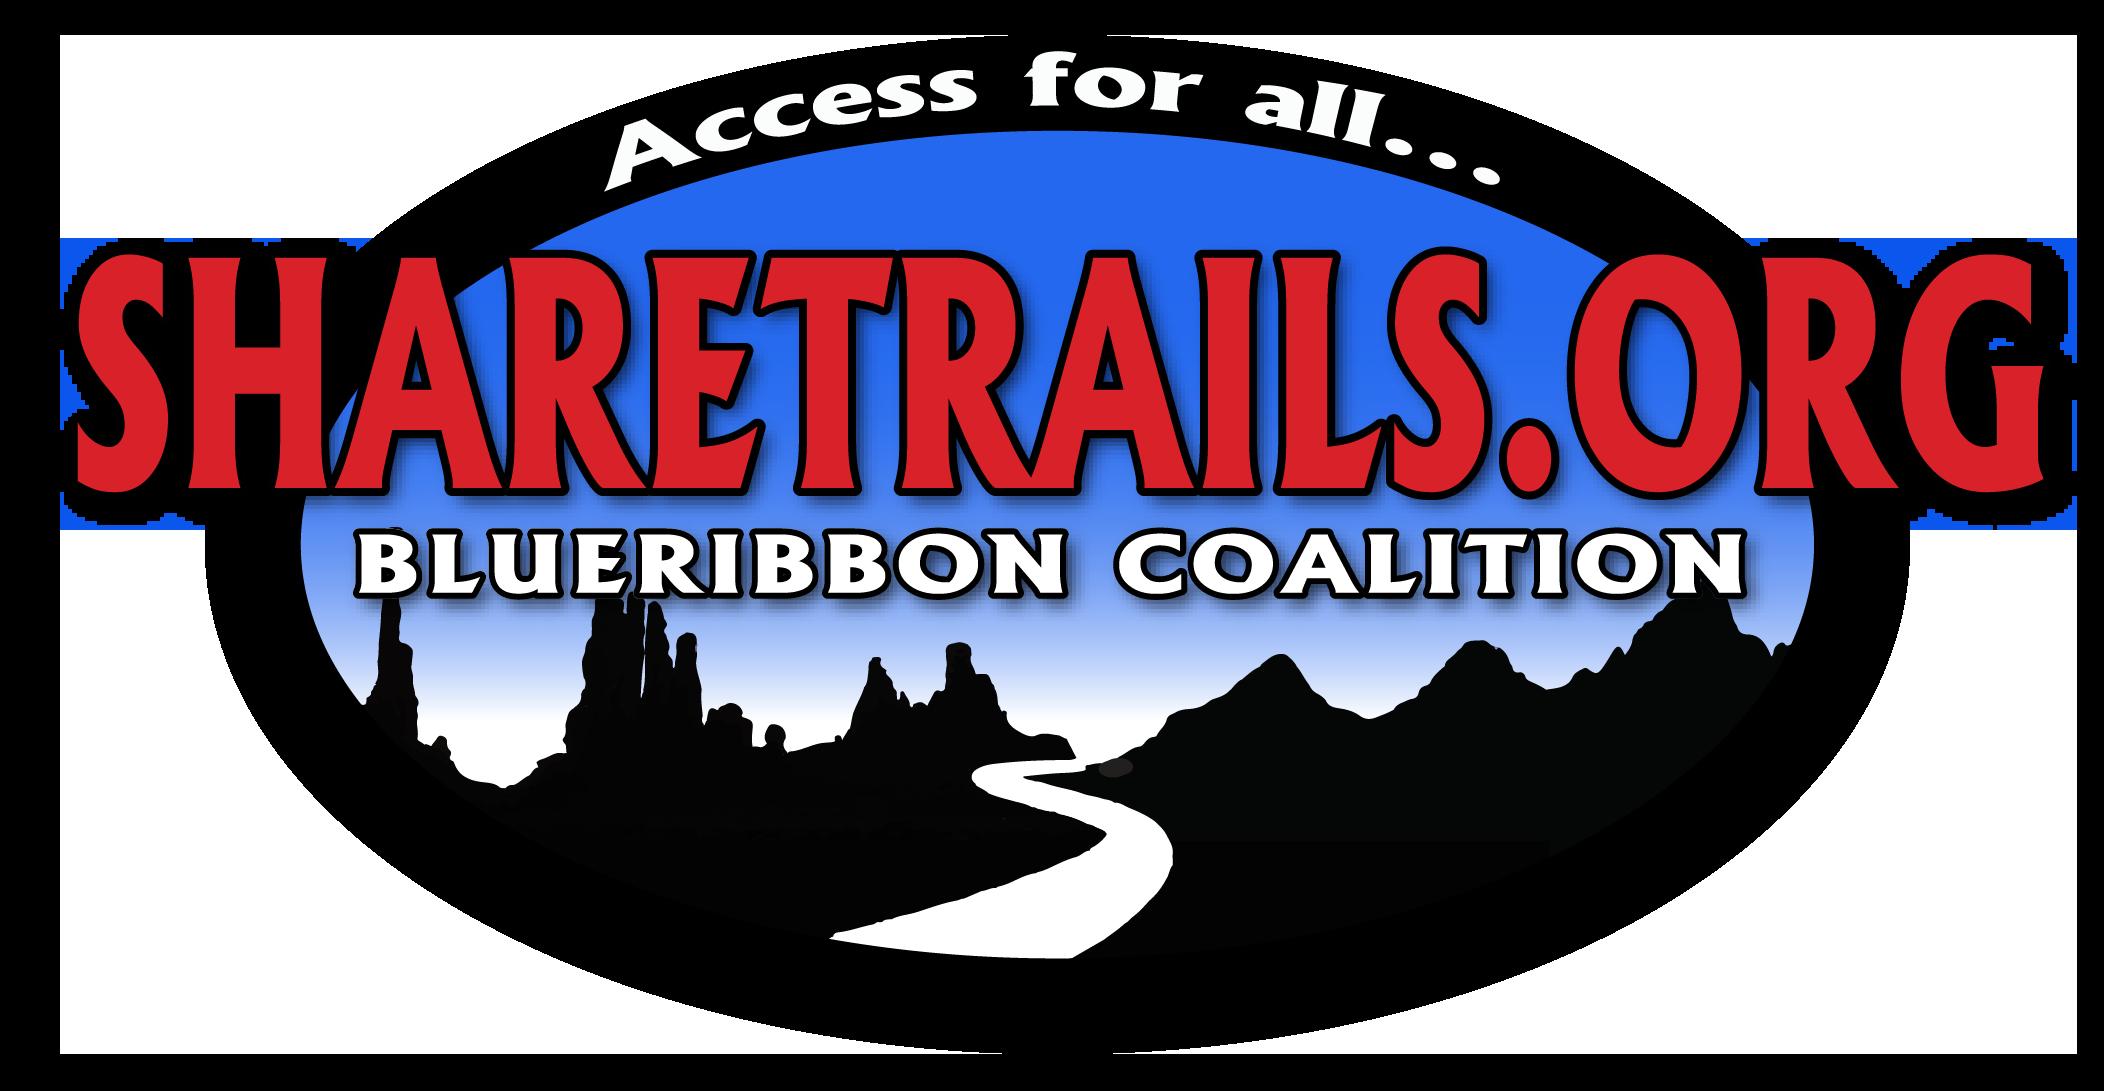 BlueRibbon Coalition/ShareTrails